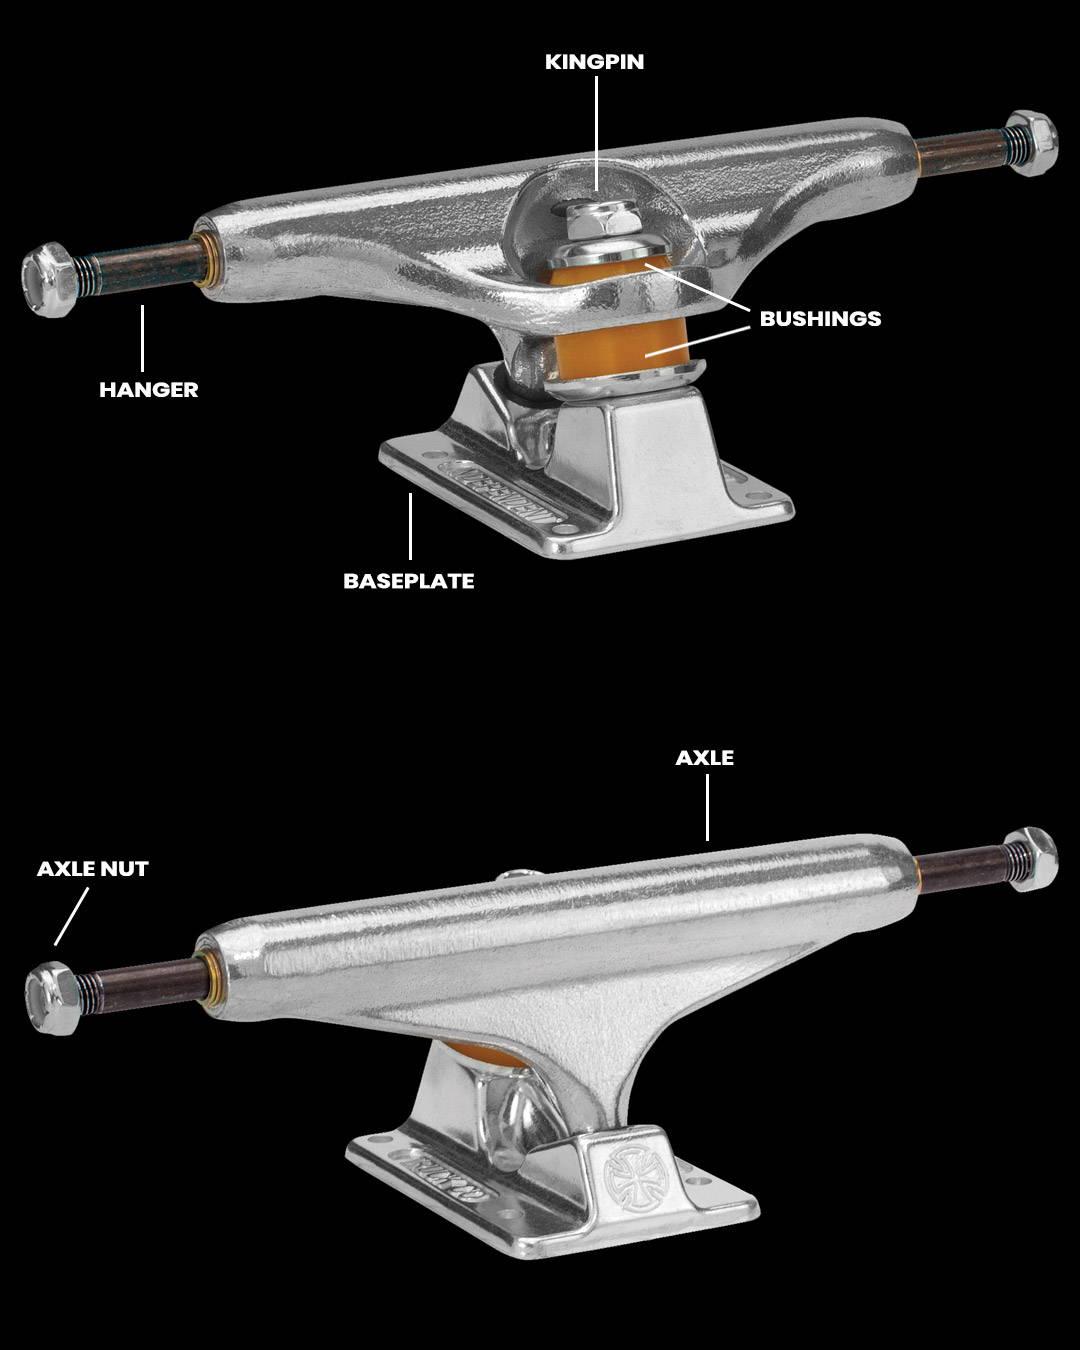 Guida skateboard - Come scegliere i truck da skateboard